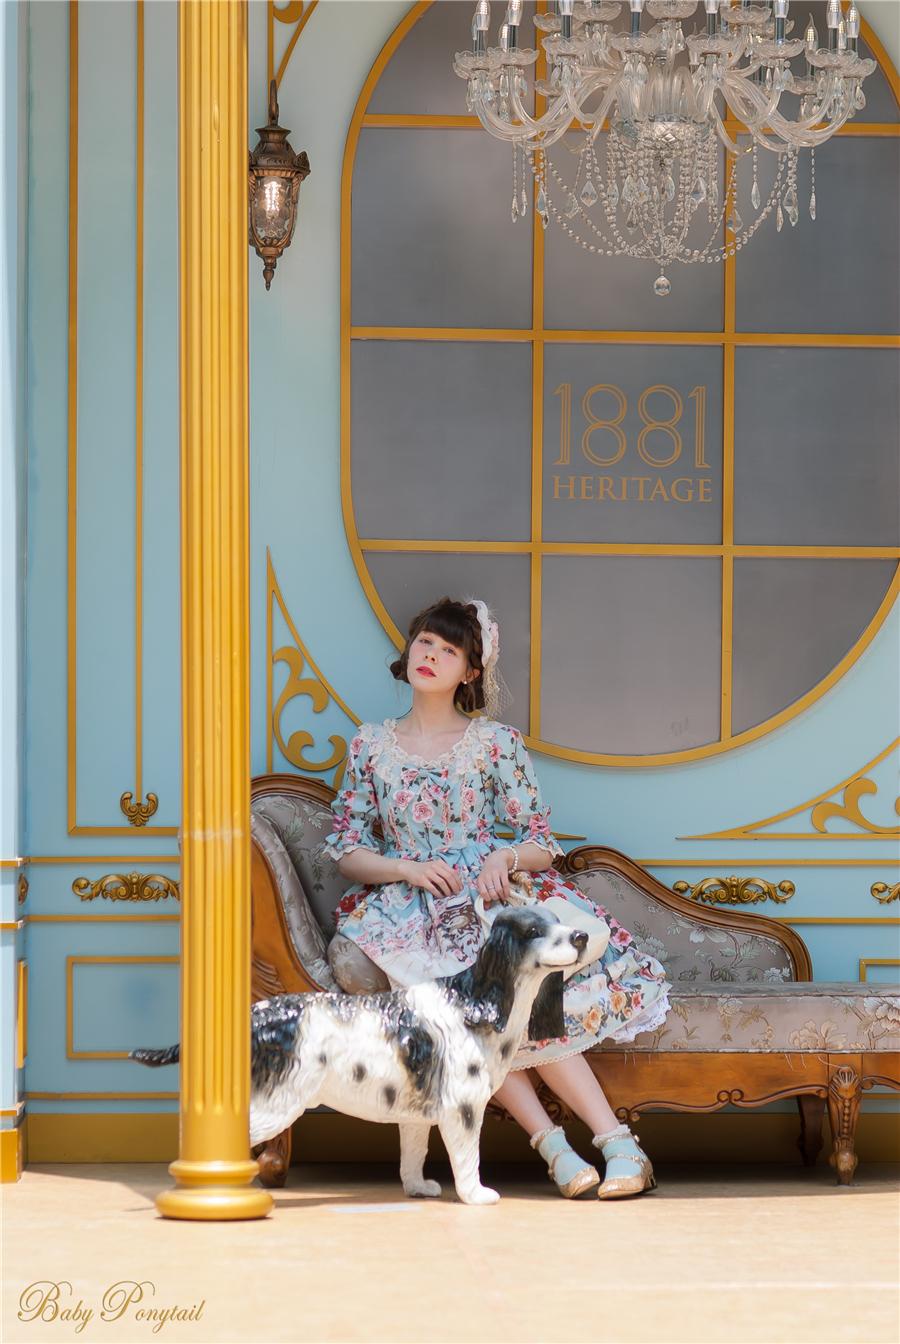 Baby Ponytail_Model Photo_Polly's Garden of Dreams_OP Lagoon Blue_Claudia_12.jpg